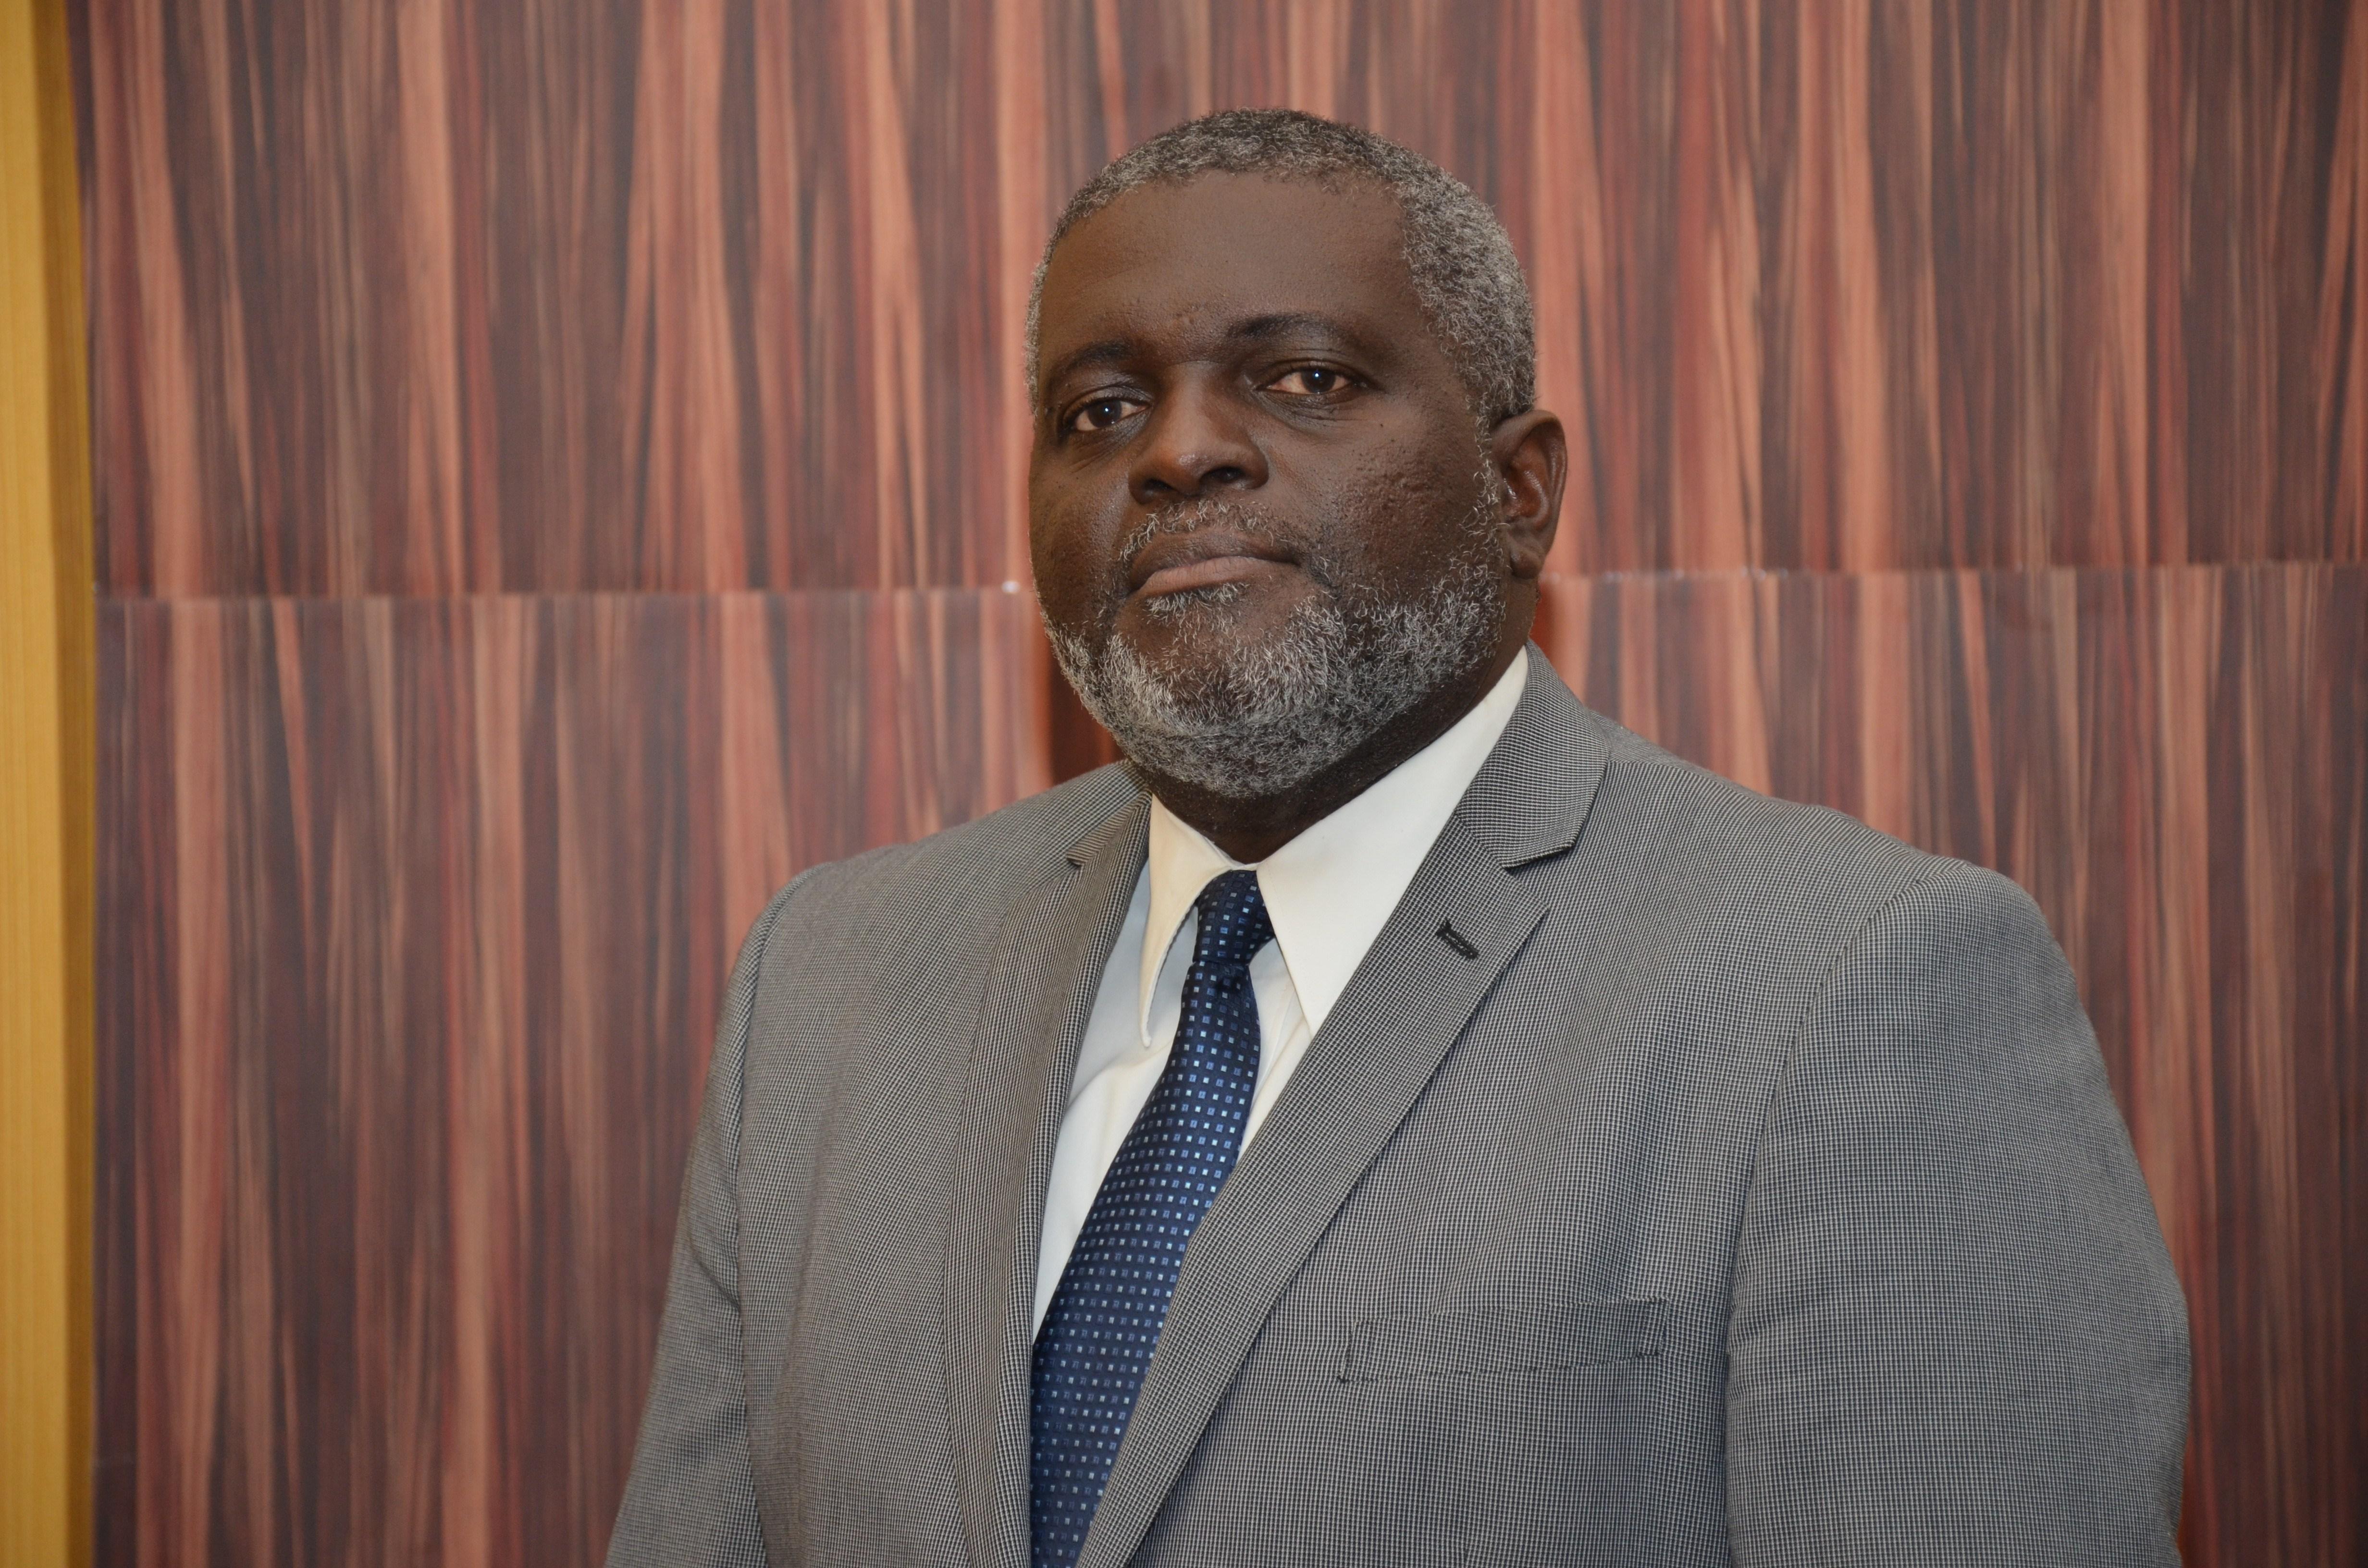 New CARICAD Director, Mr. Devon Rowe